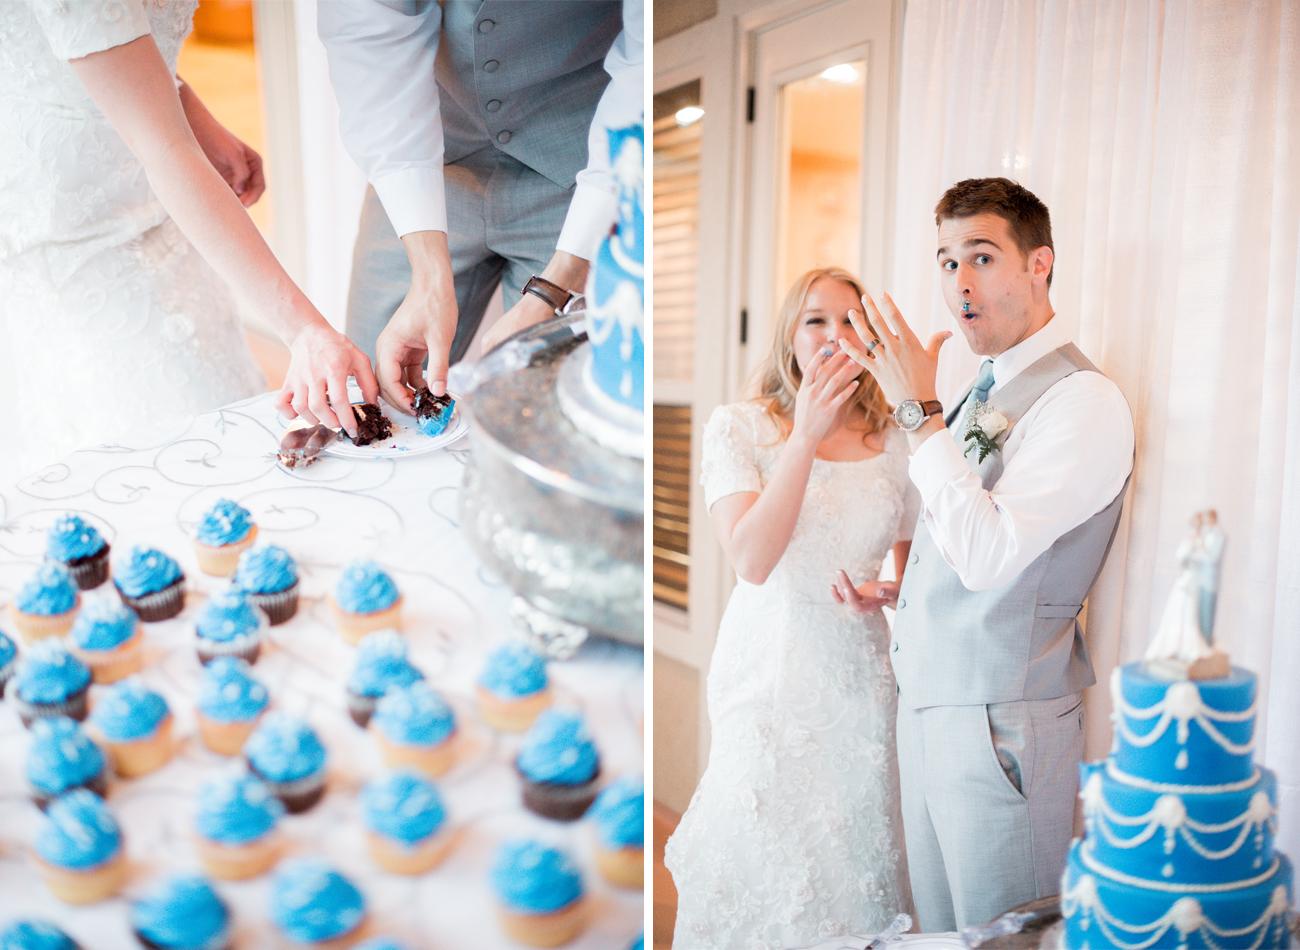 Rebekah and Brian | San Antonio LDS Wedding Photographer-31.5